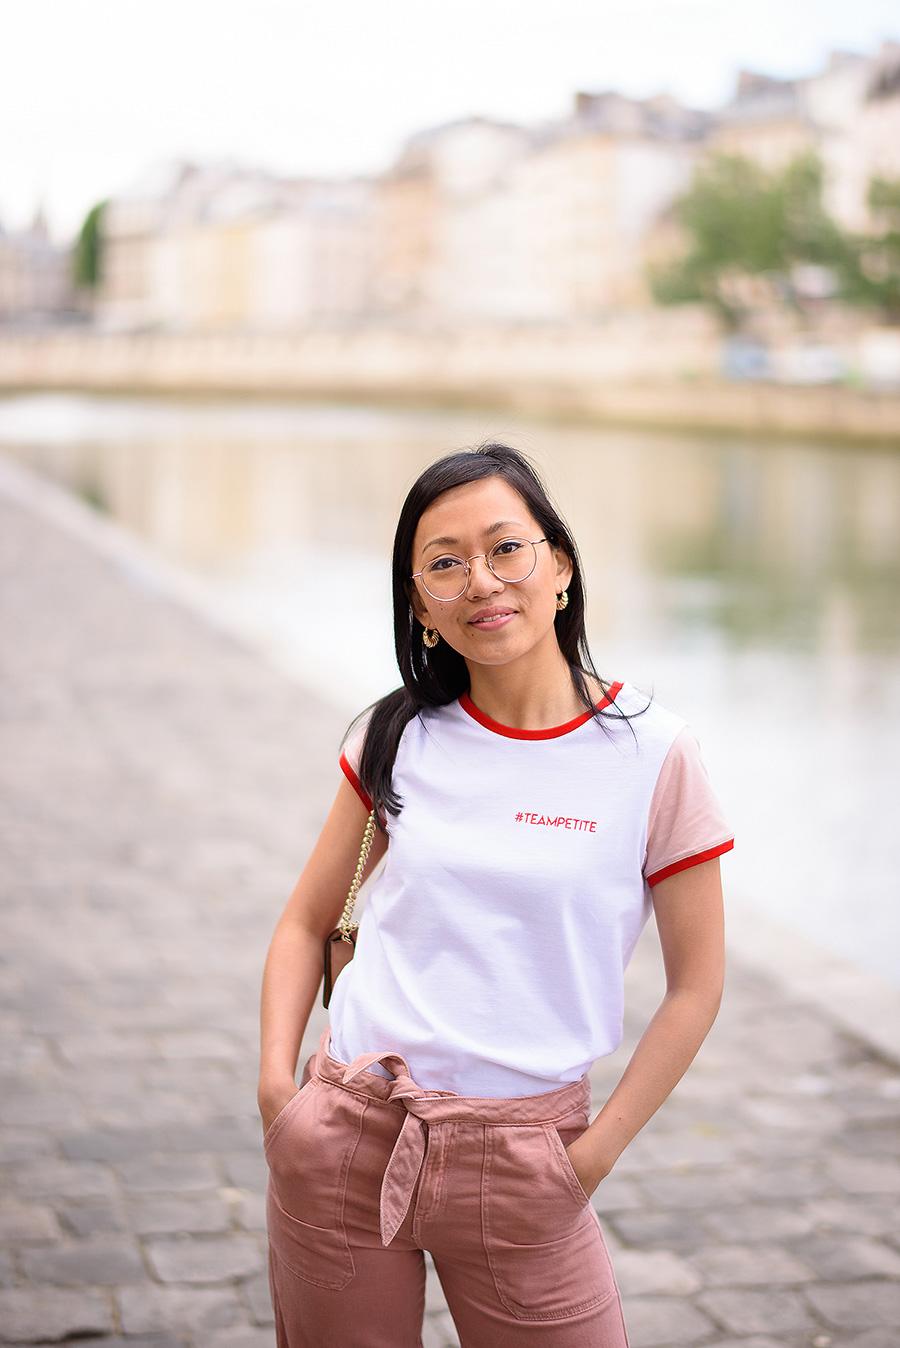 petite-and-so-what-tee-shirt-teampetite